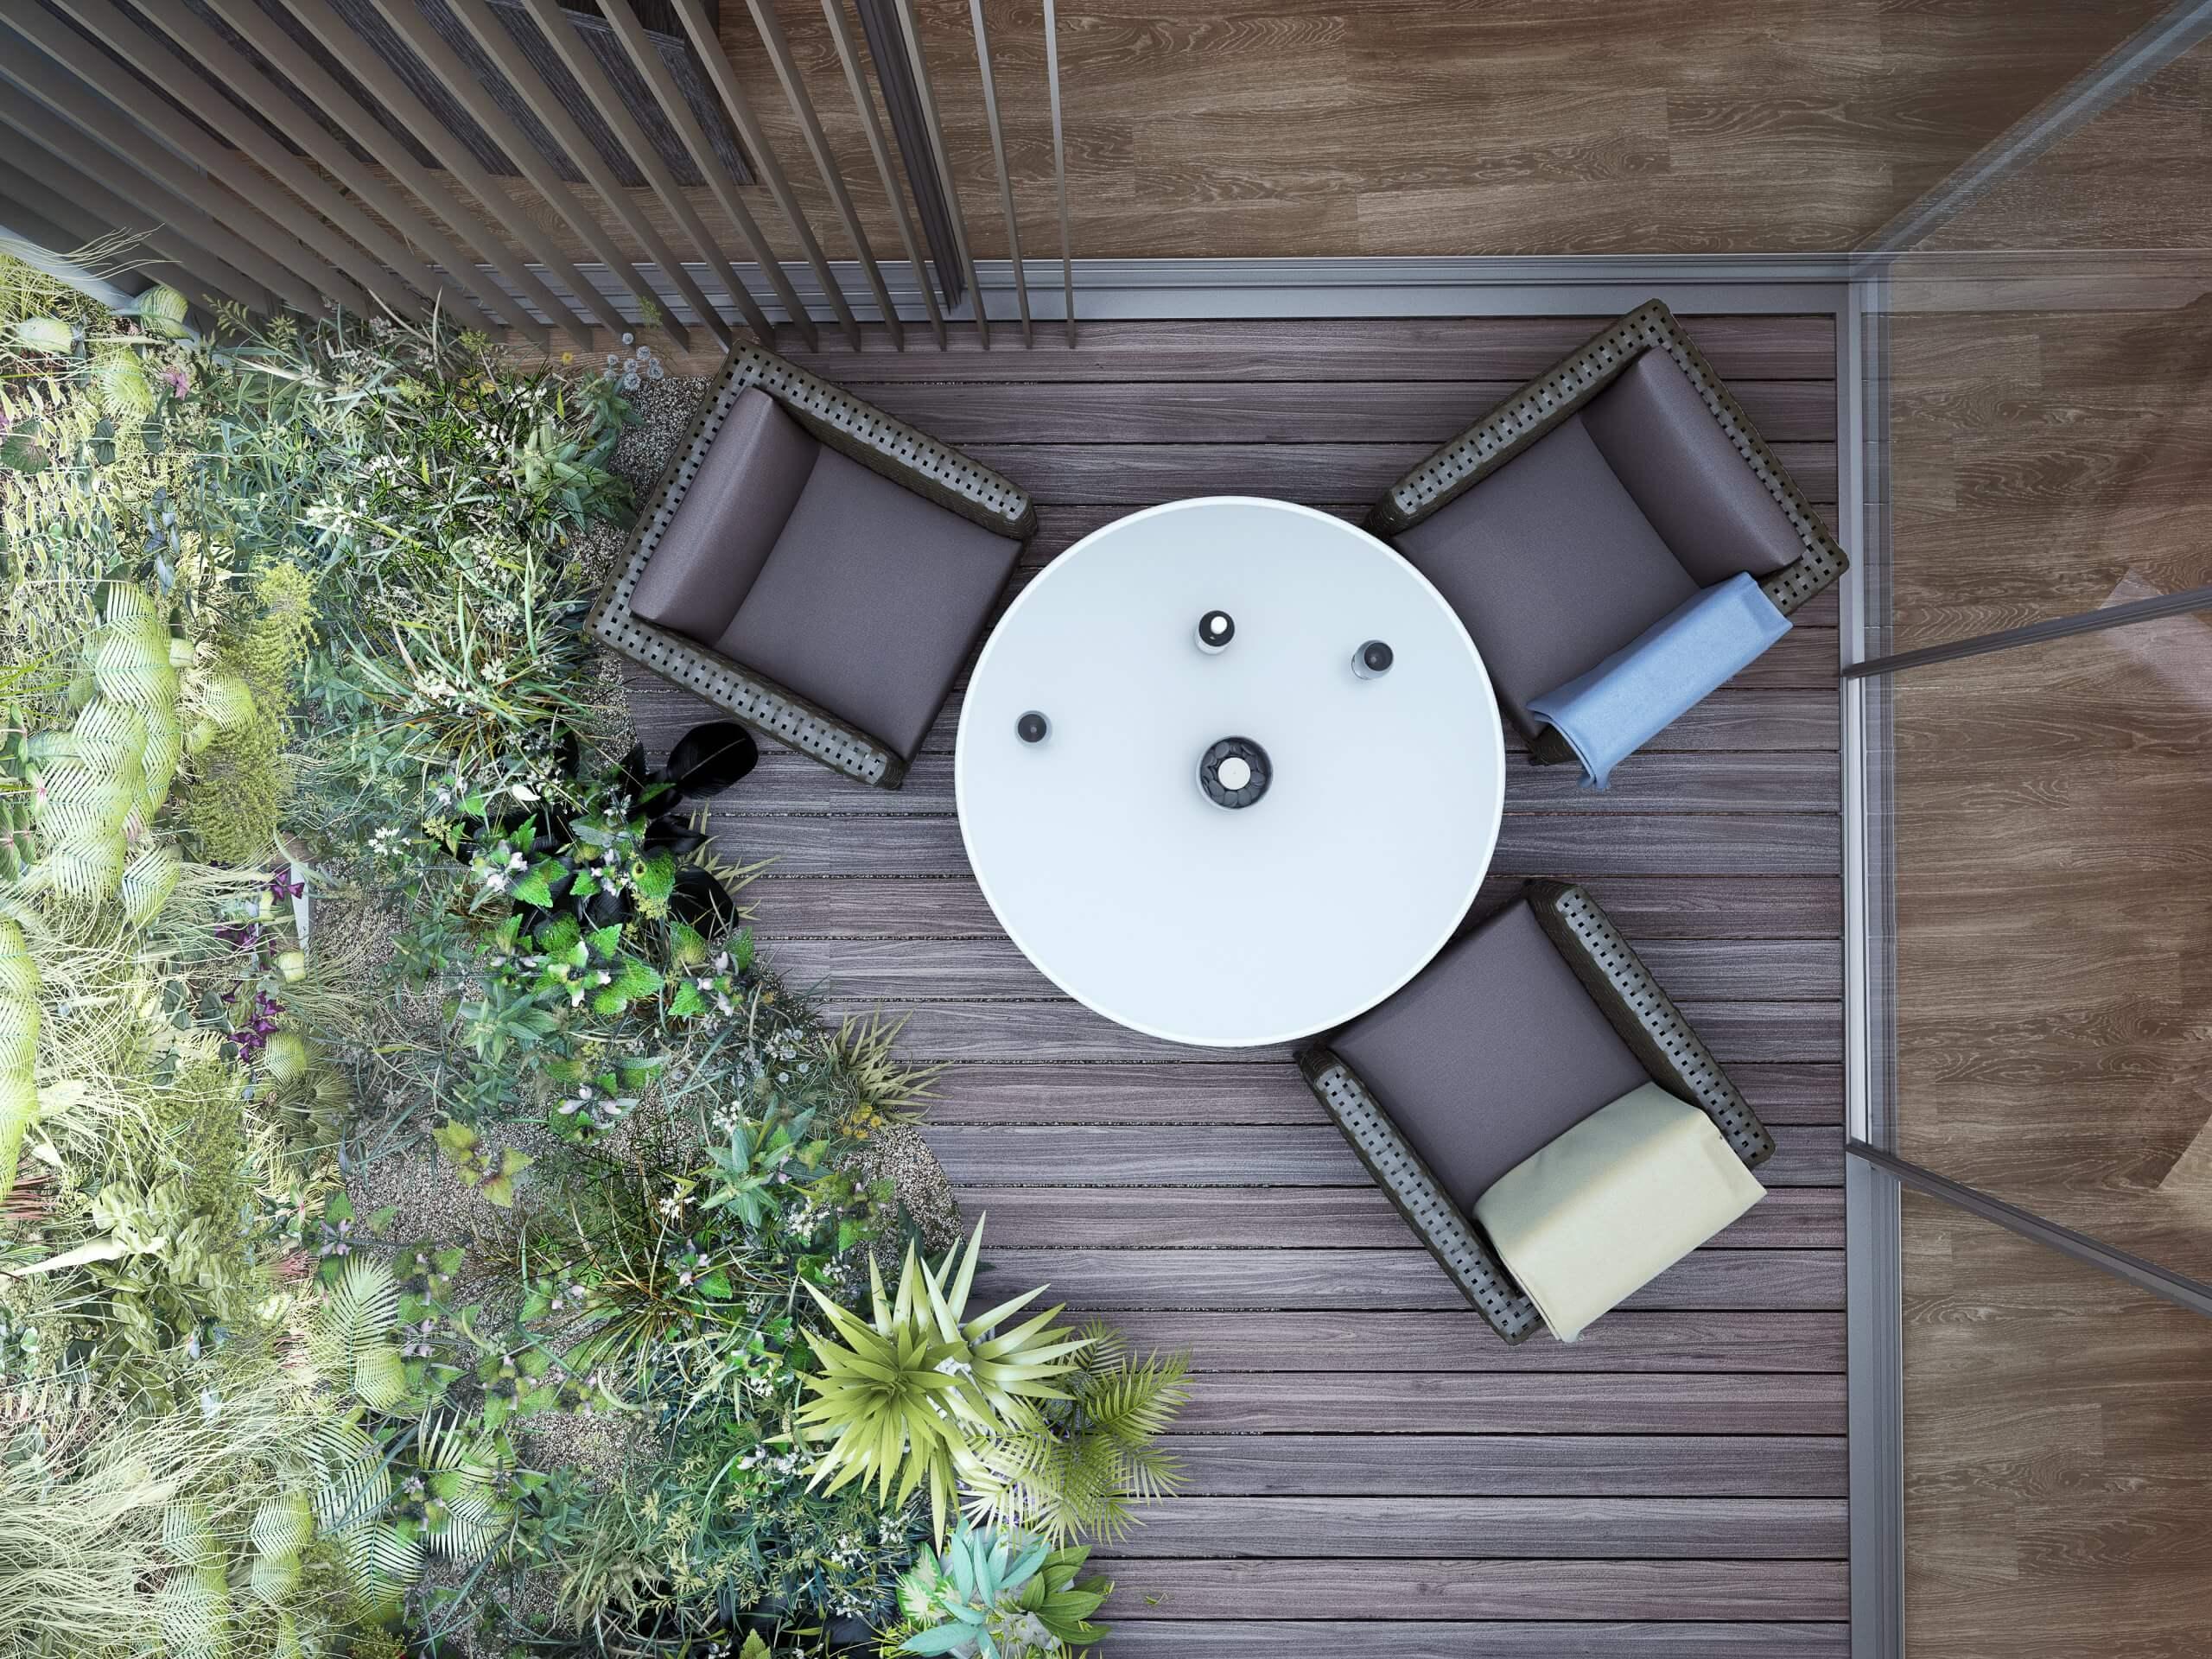 LEE01-1-Courtyard-Vignette-01